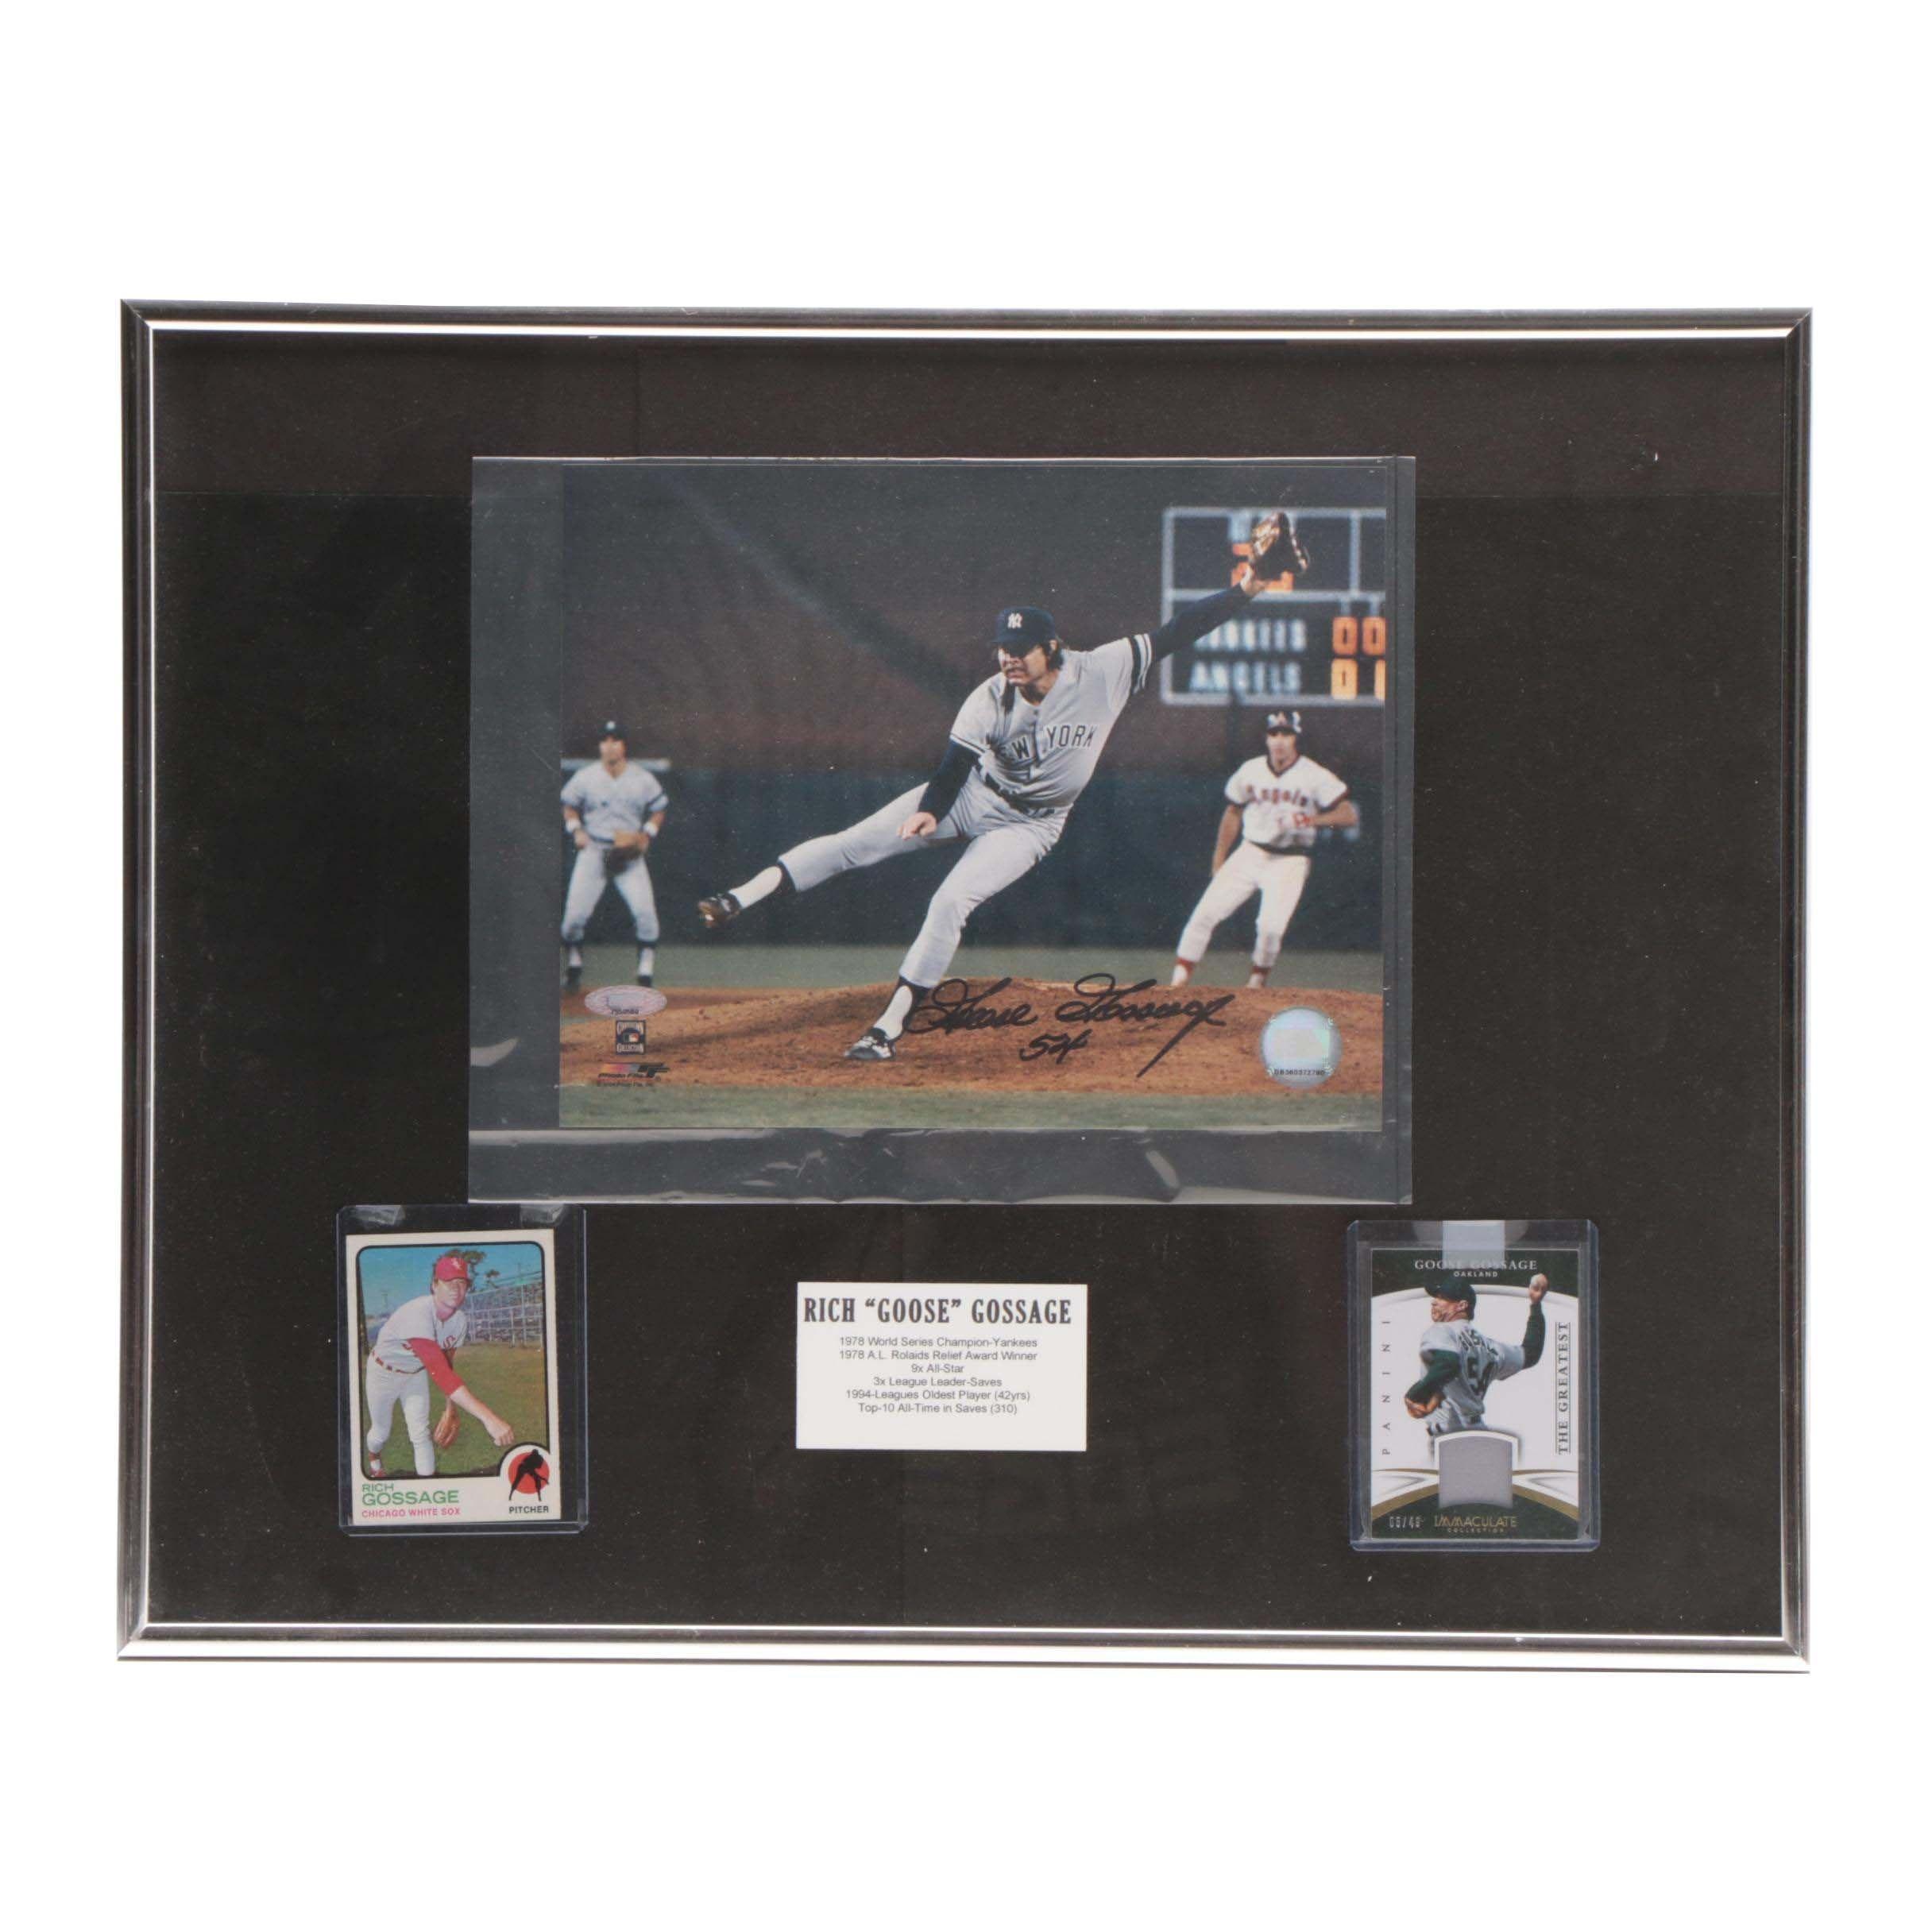 "HOF Rich ""Goose"" Gossage Signed Framed Baseball Display COA"